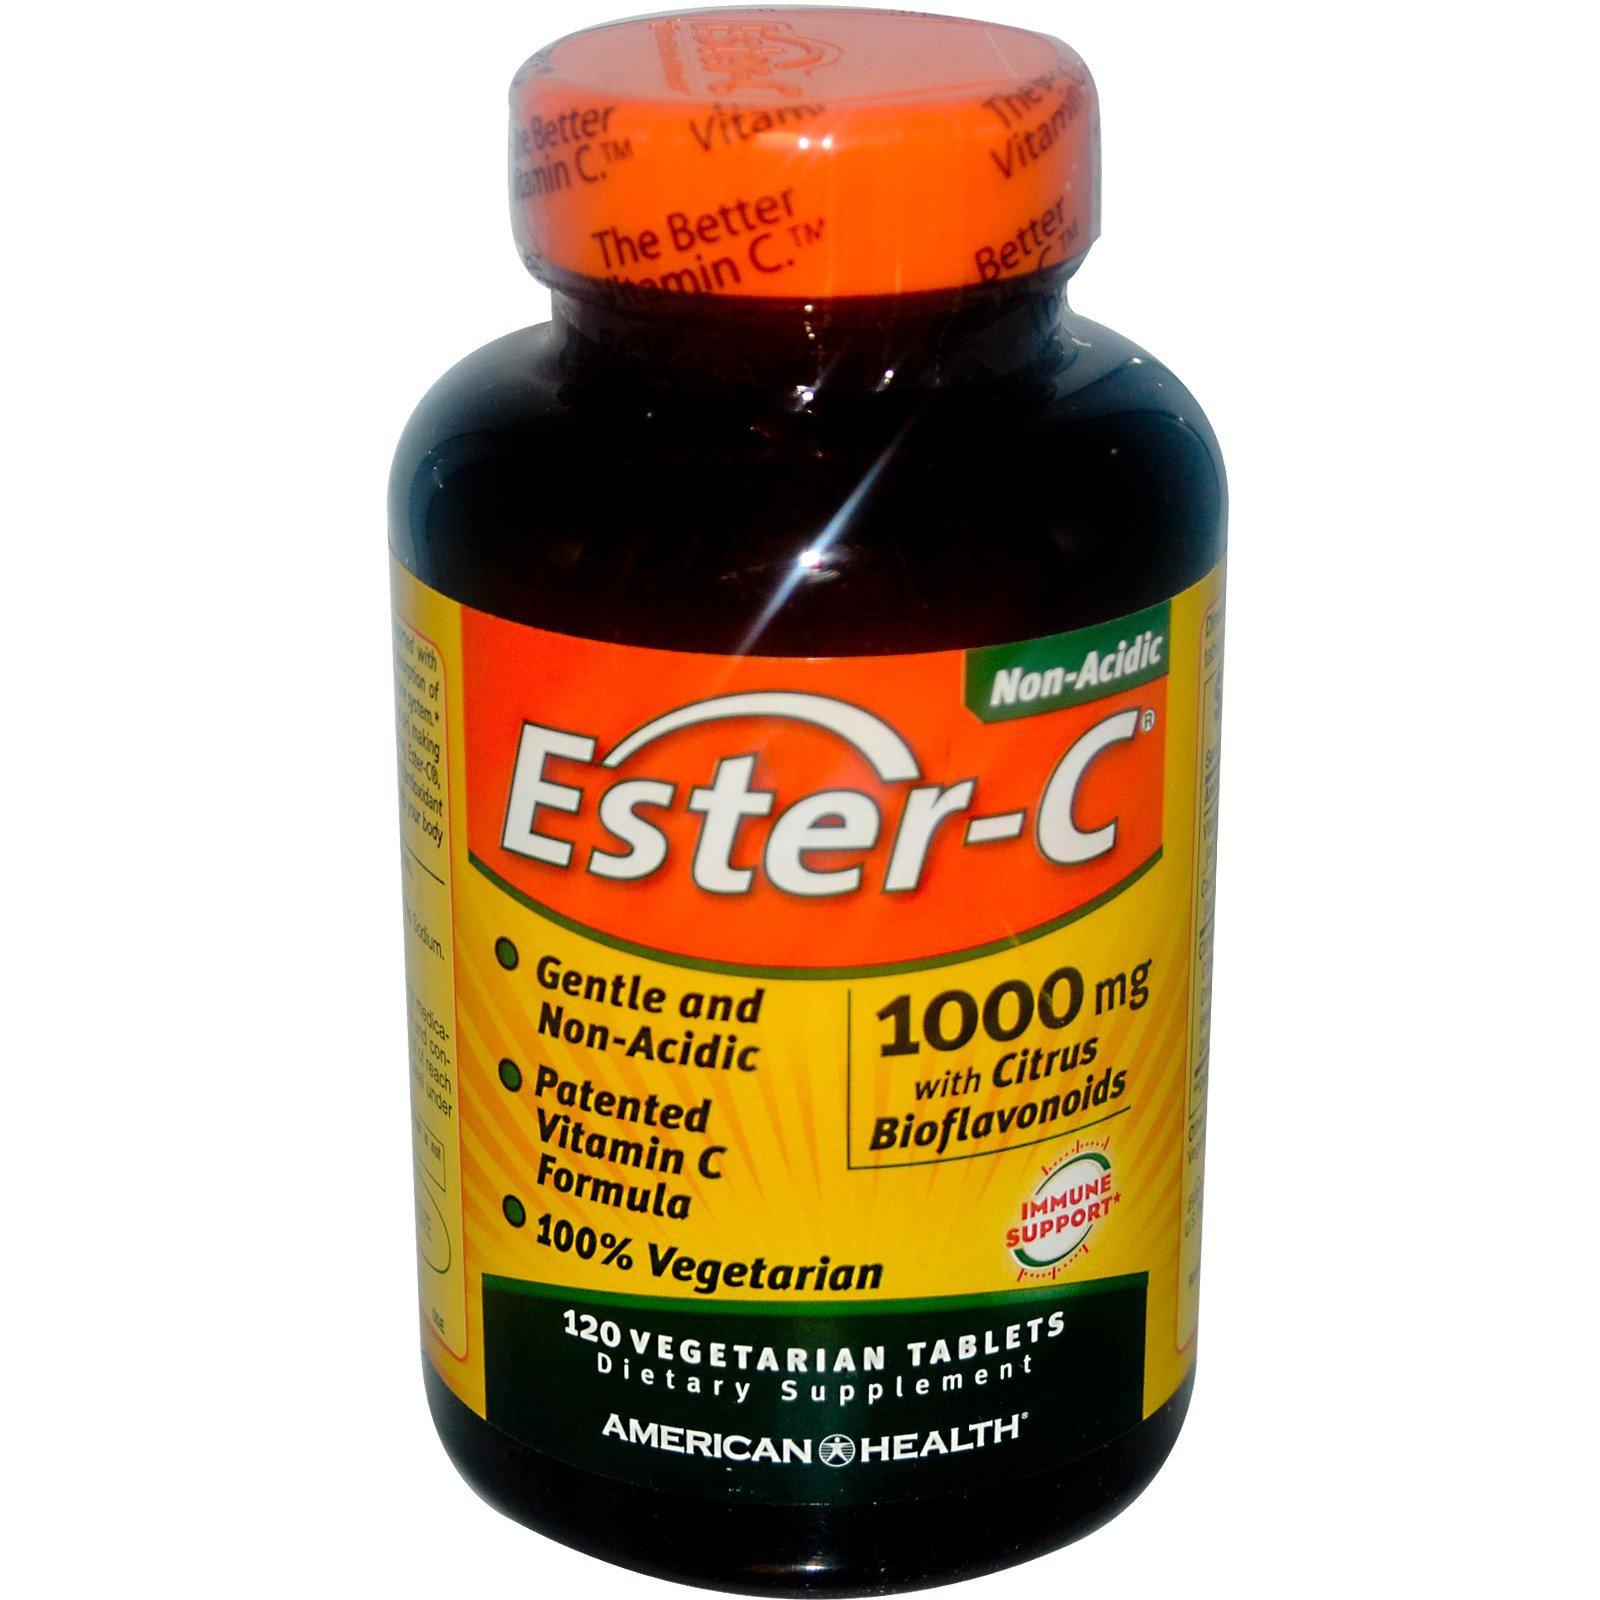 Image of Ester-C- 1000 mg (120 vegetarian tablets) - American Health 0076630169820